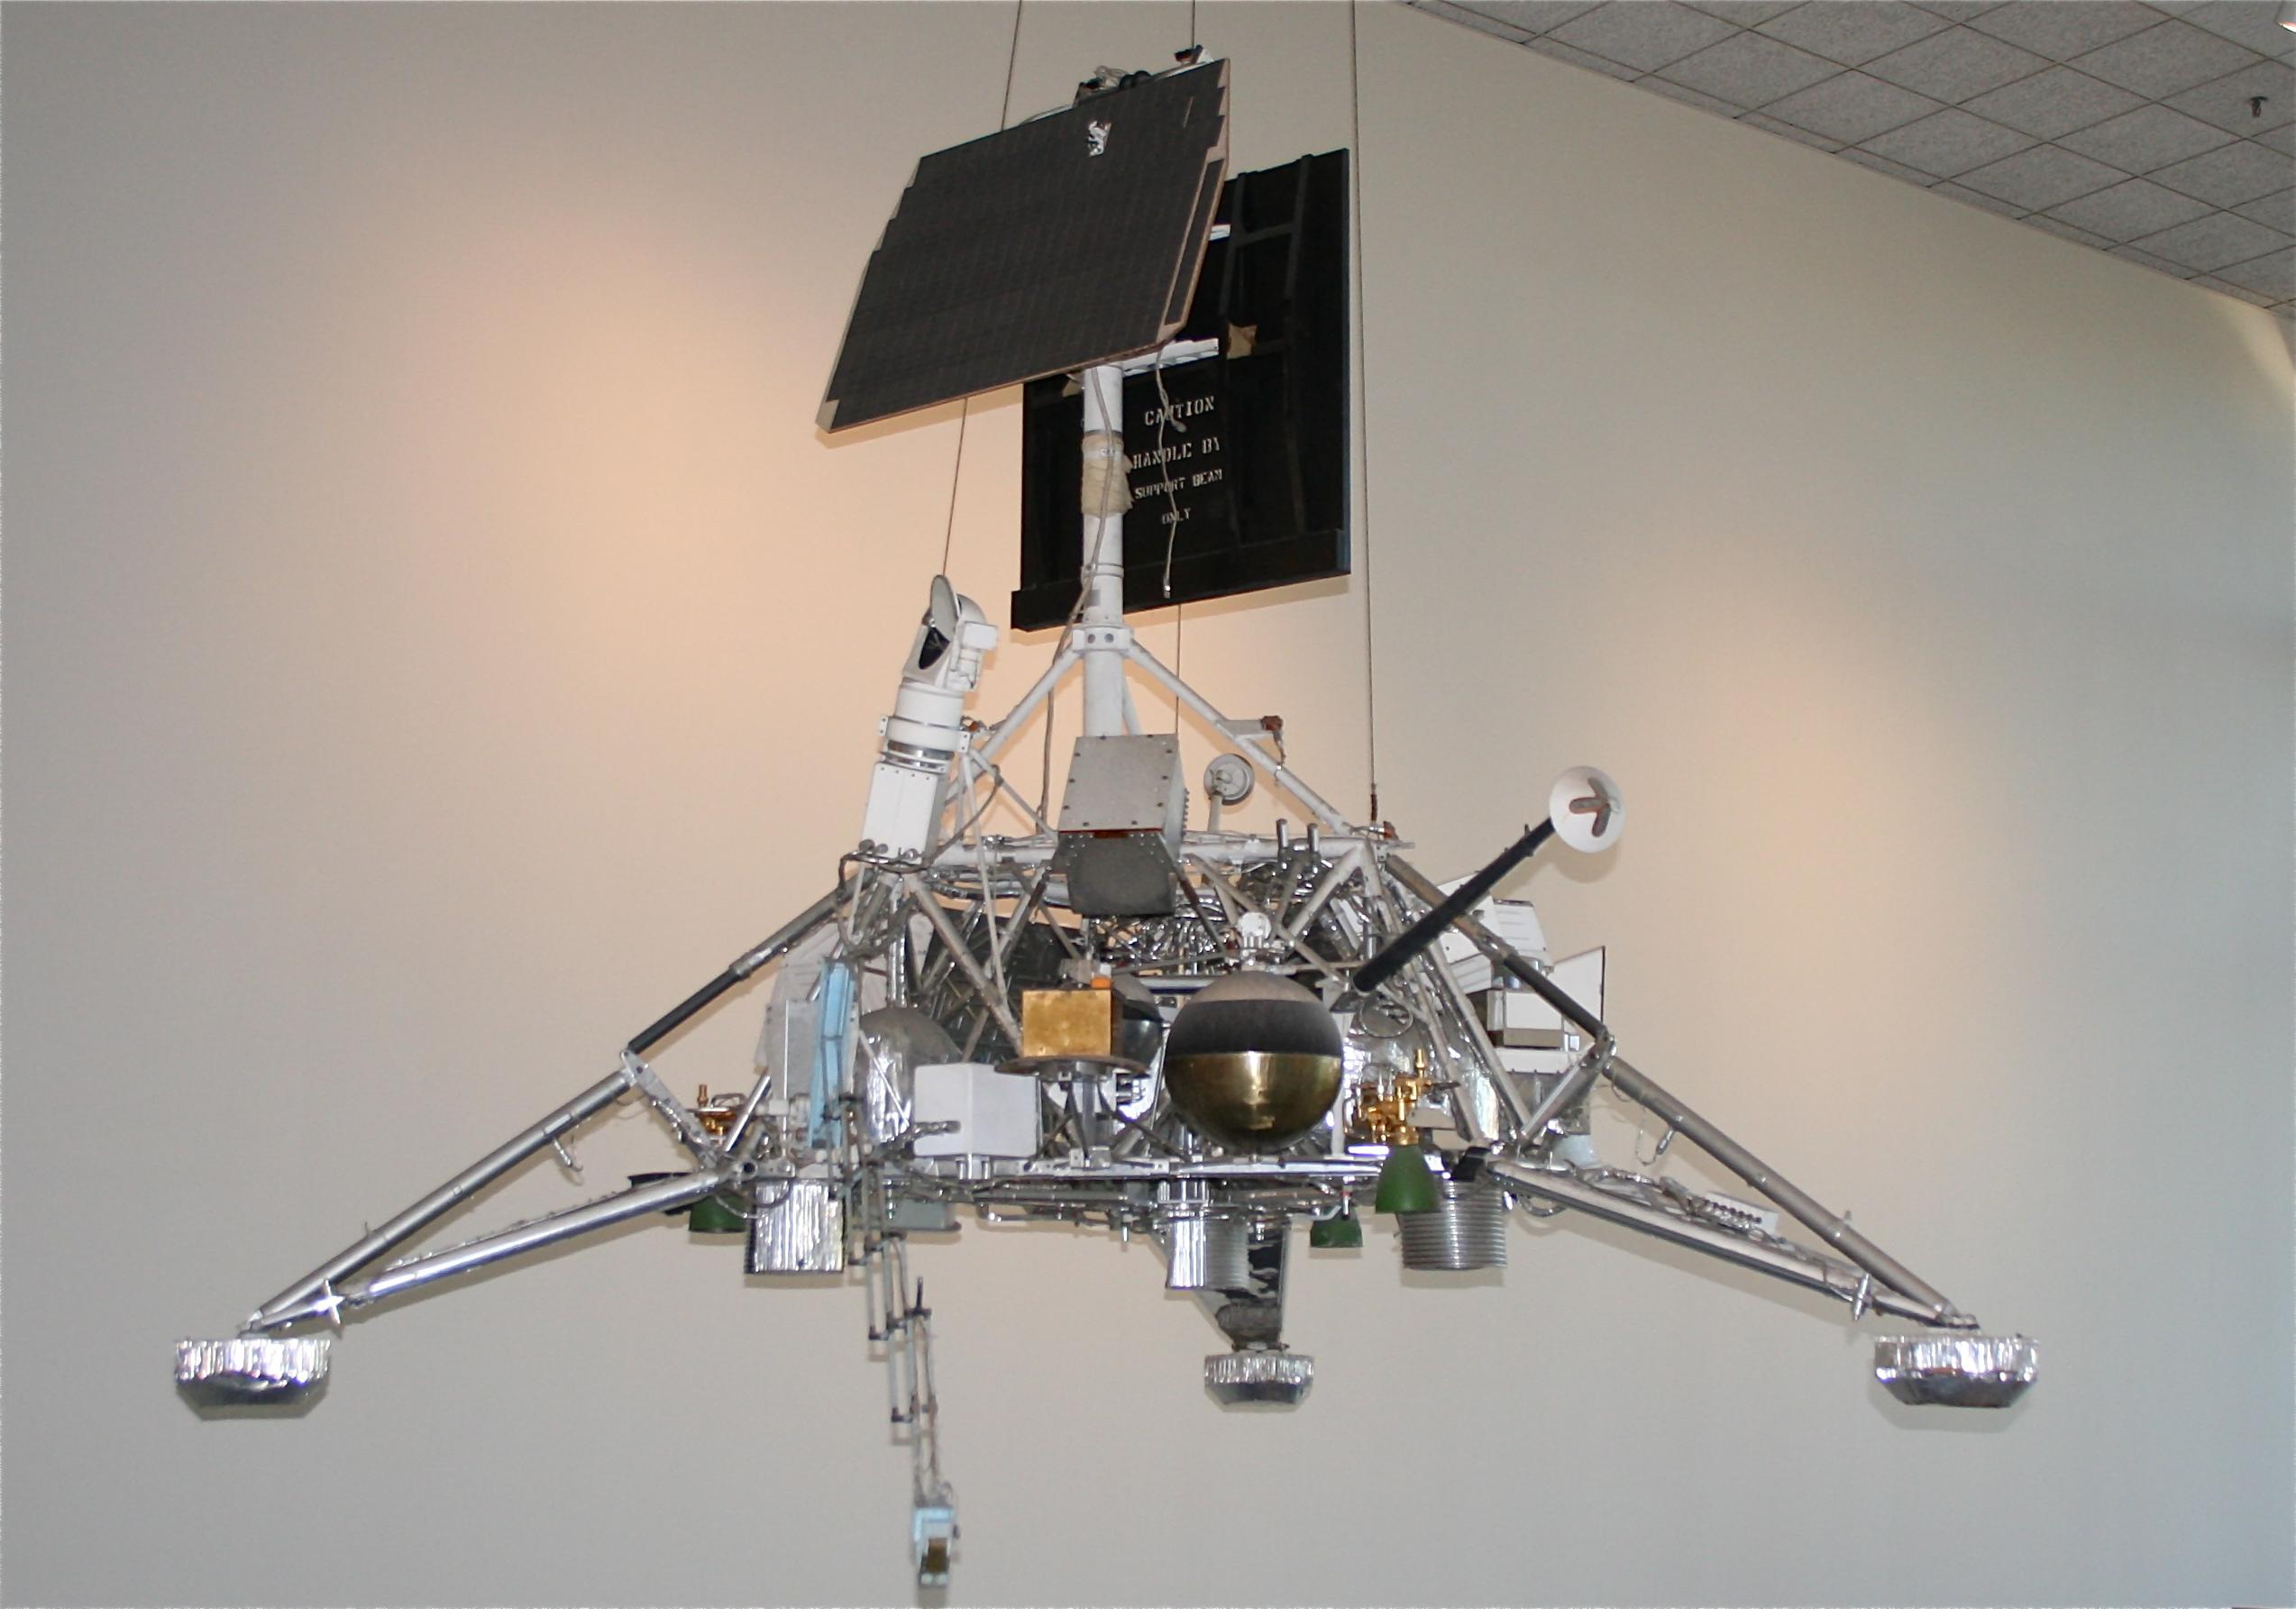 surveyor spacecraft drawings - photo #7